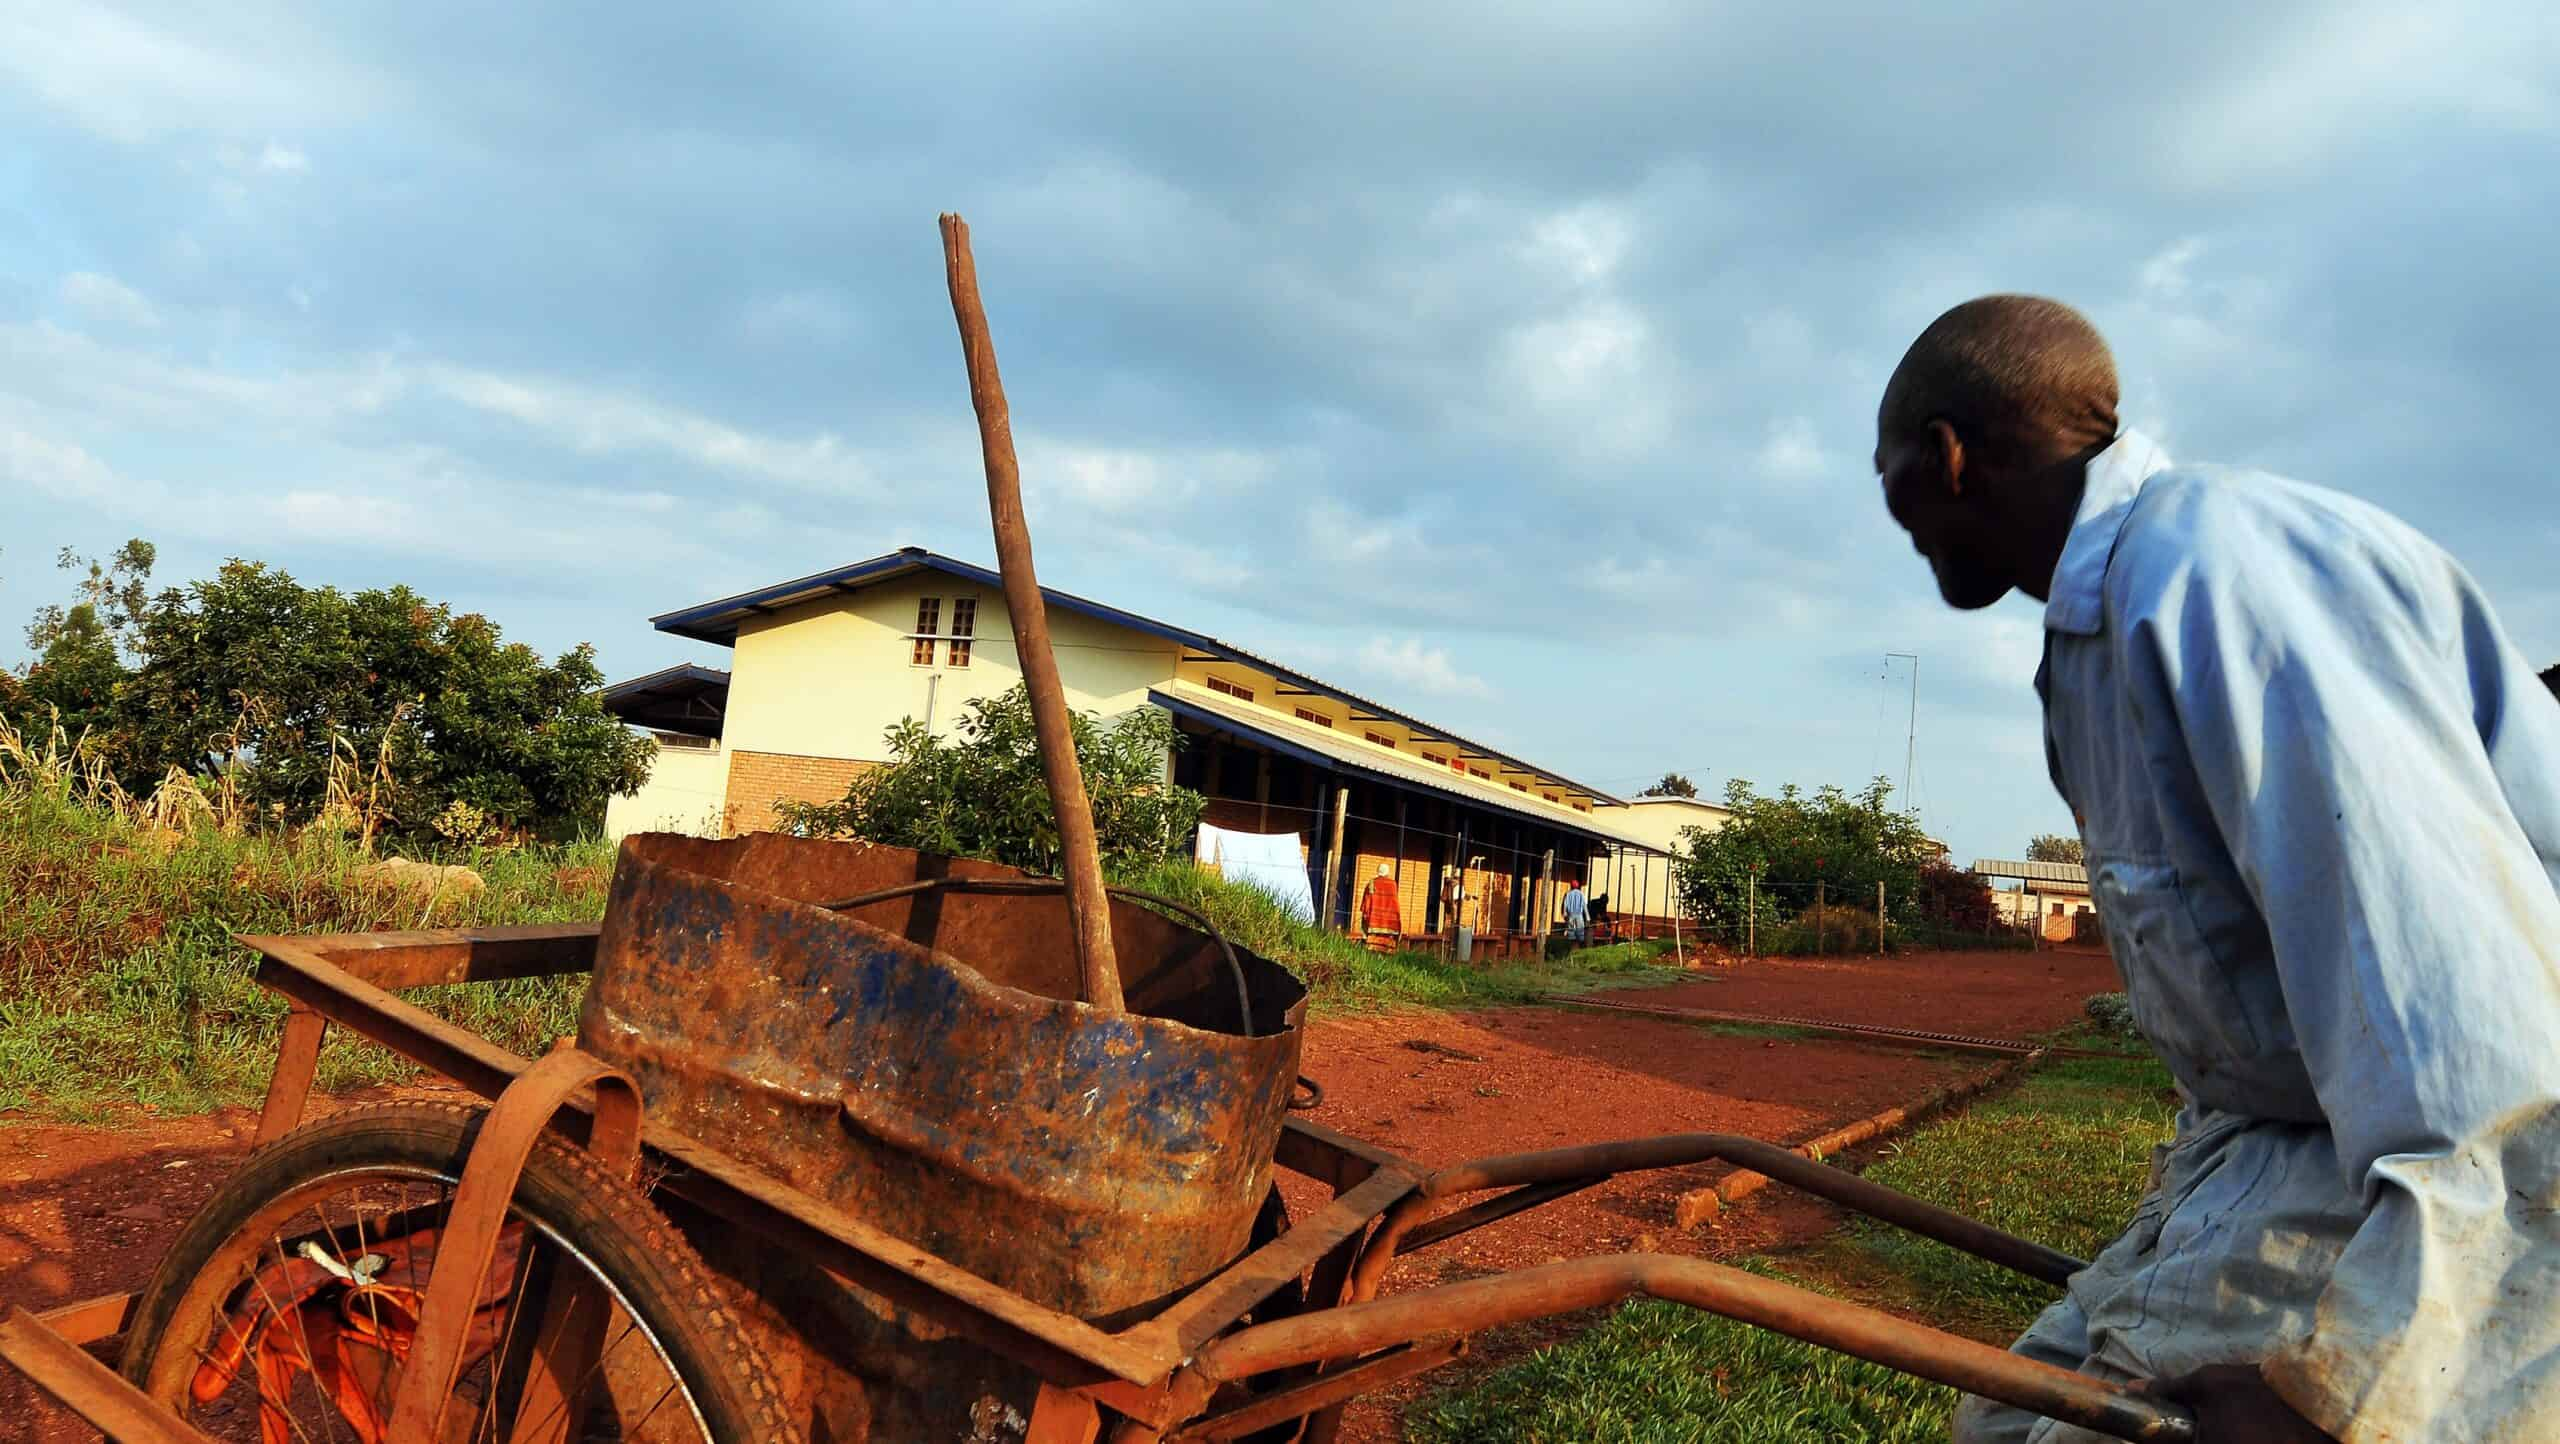 Paesi poveri, il Burundi